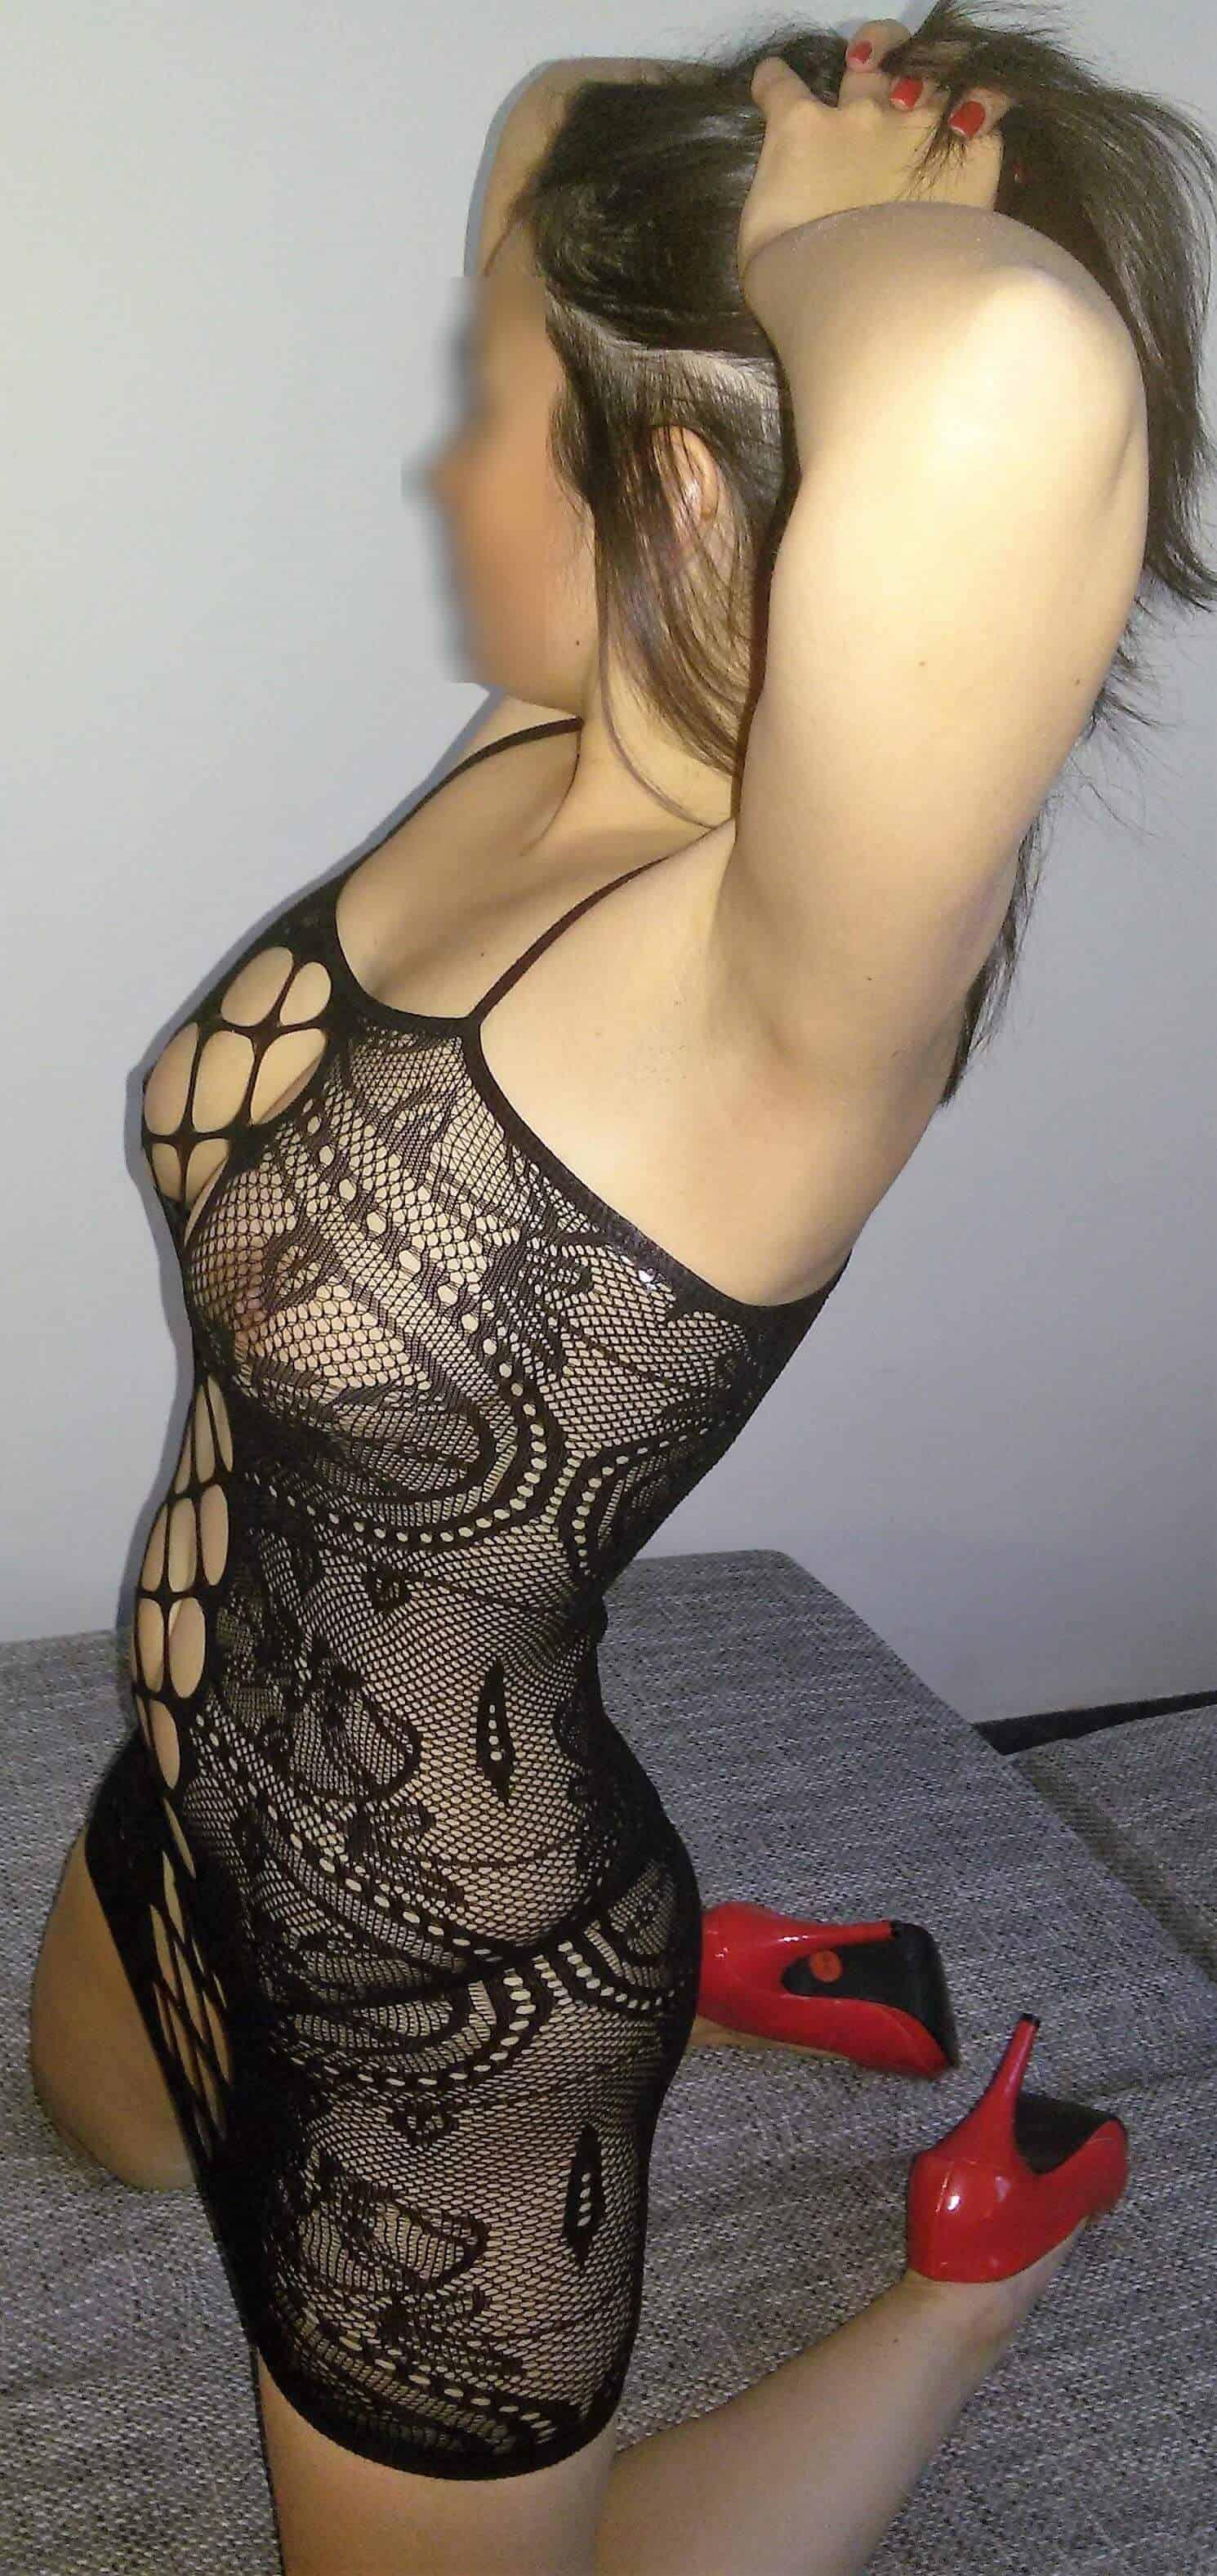 servis fetiš sex